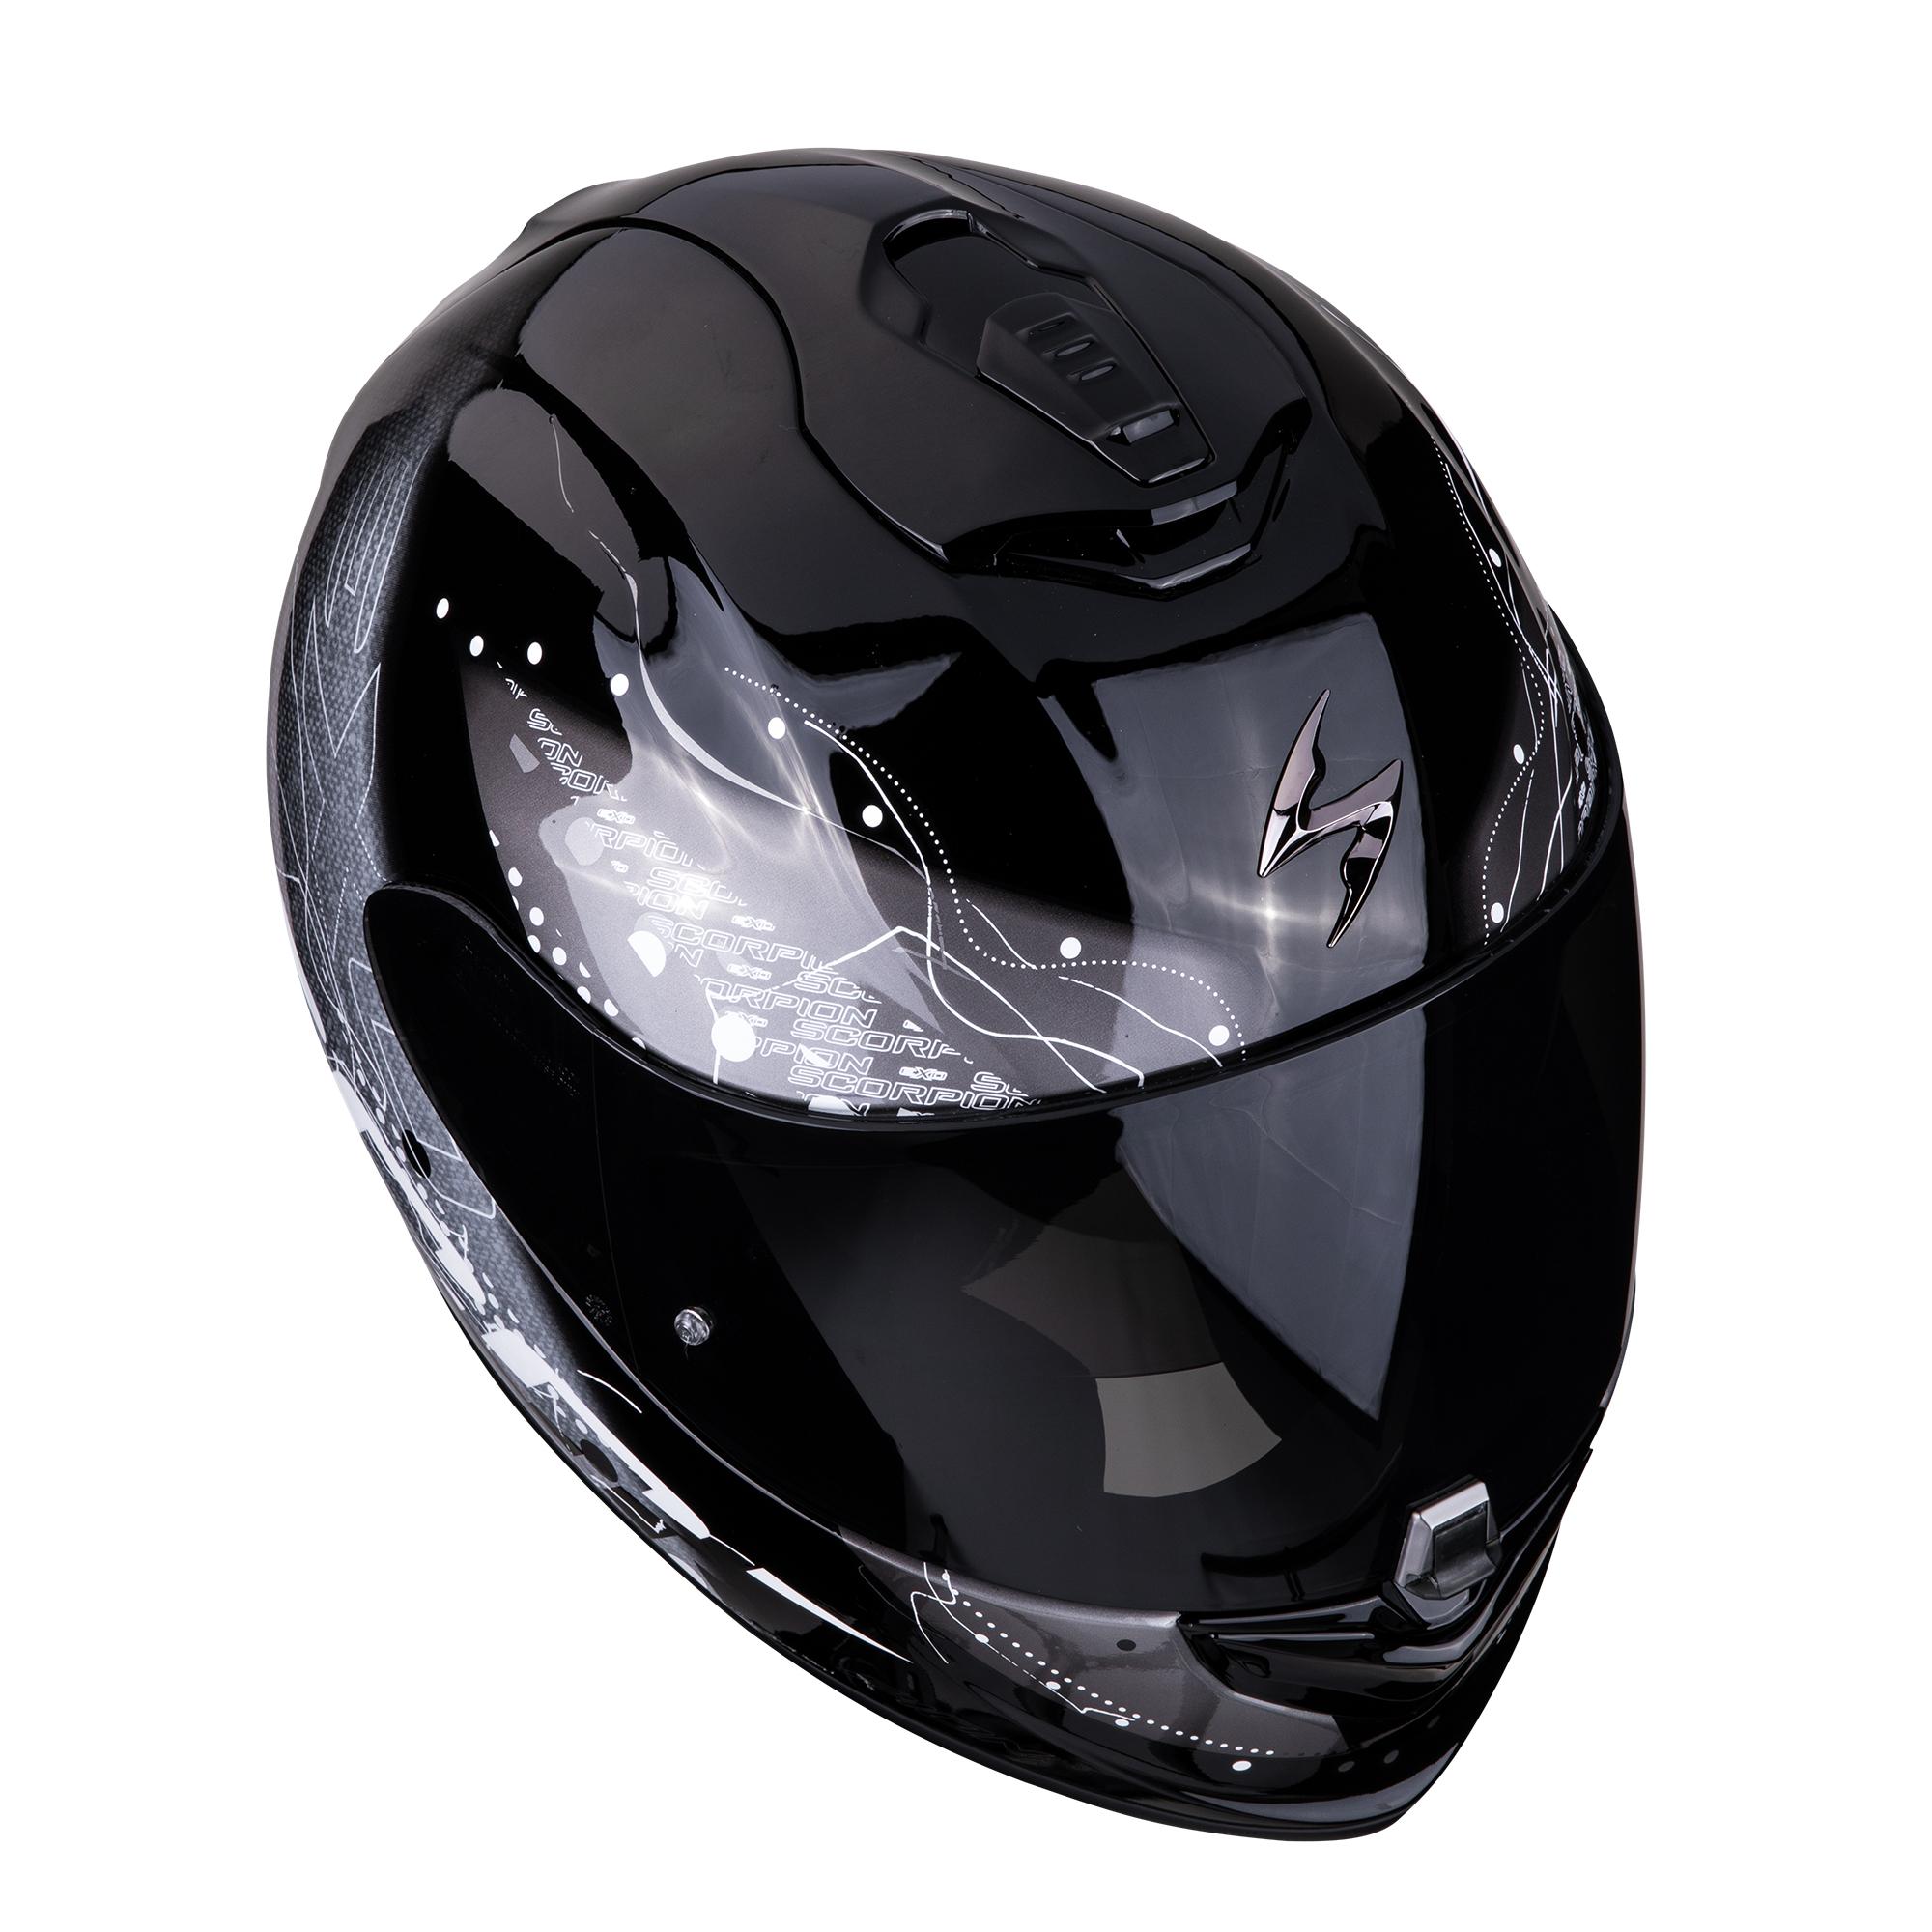 /272/ Scorpion 14/ /exo-1400/Air Classy black-red XS /24/